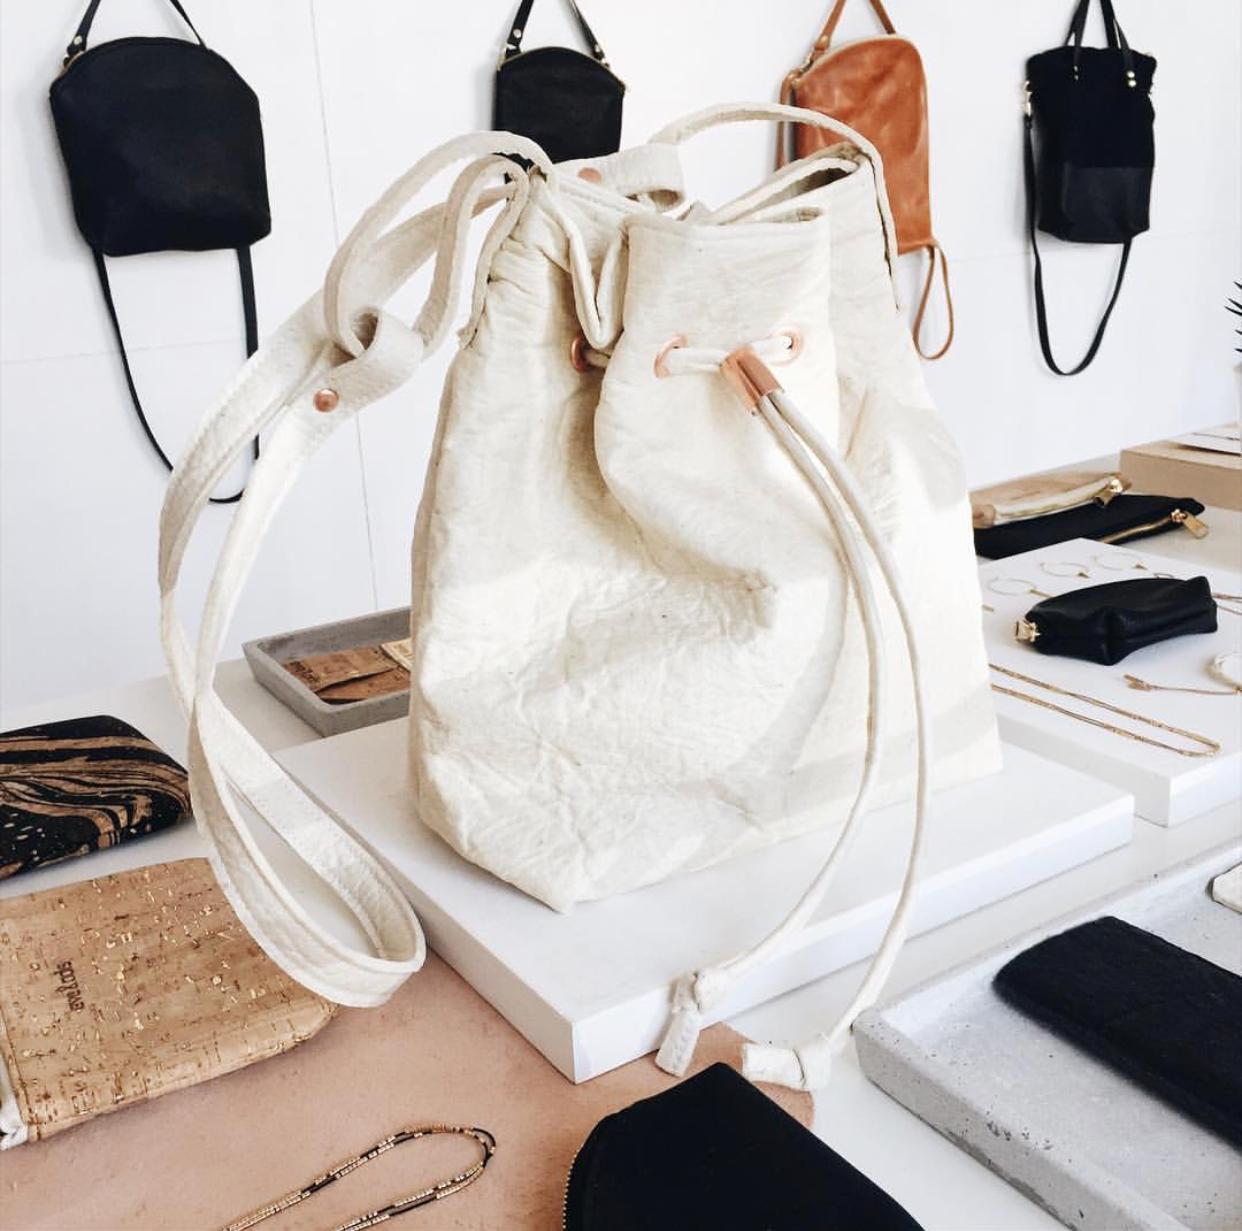 Pinatex bag by  Eve and Adis